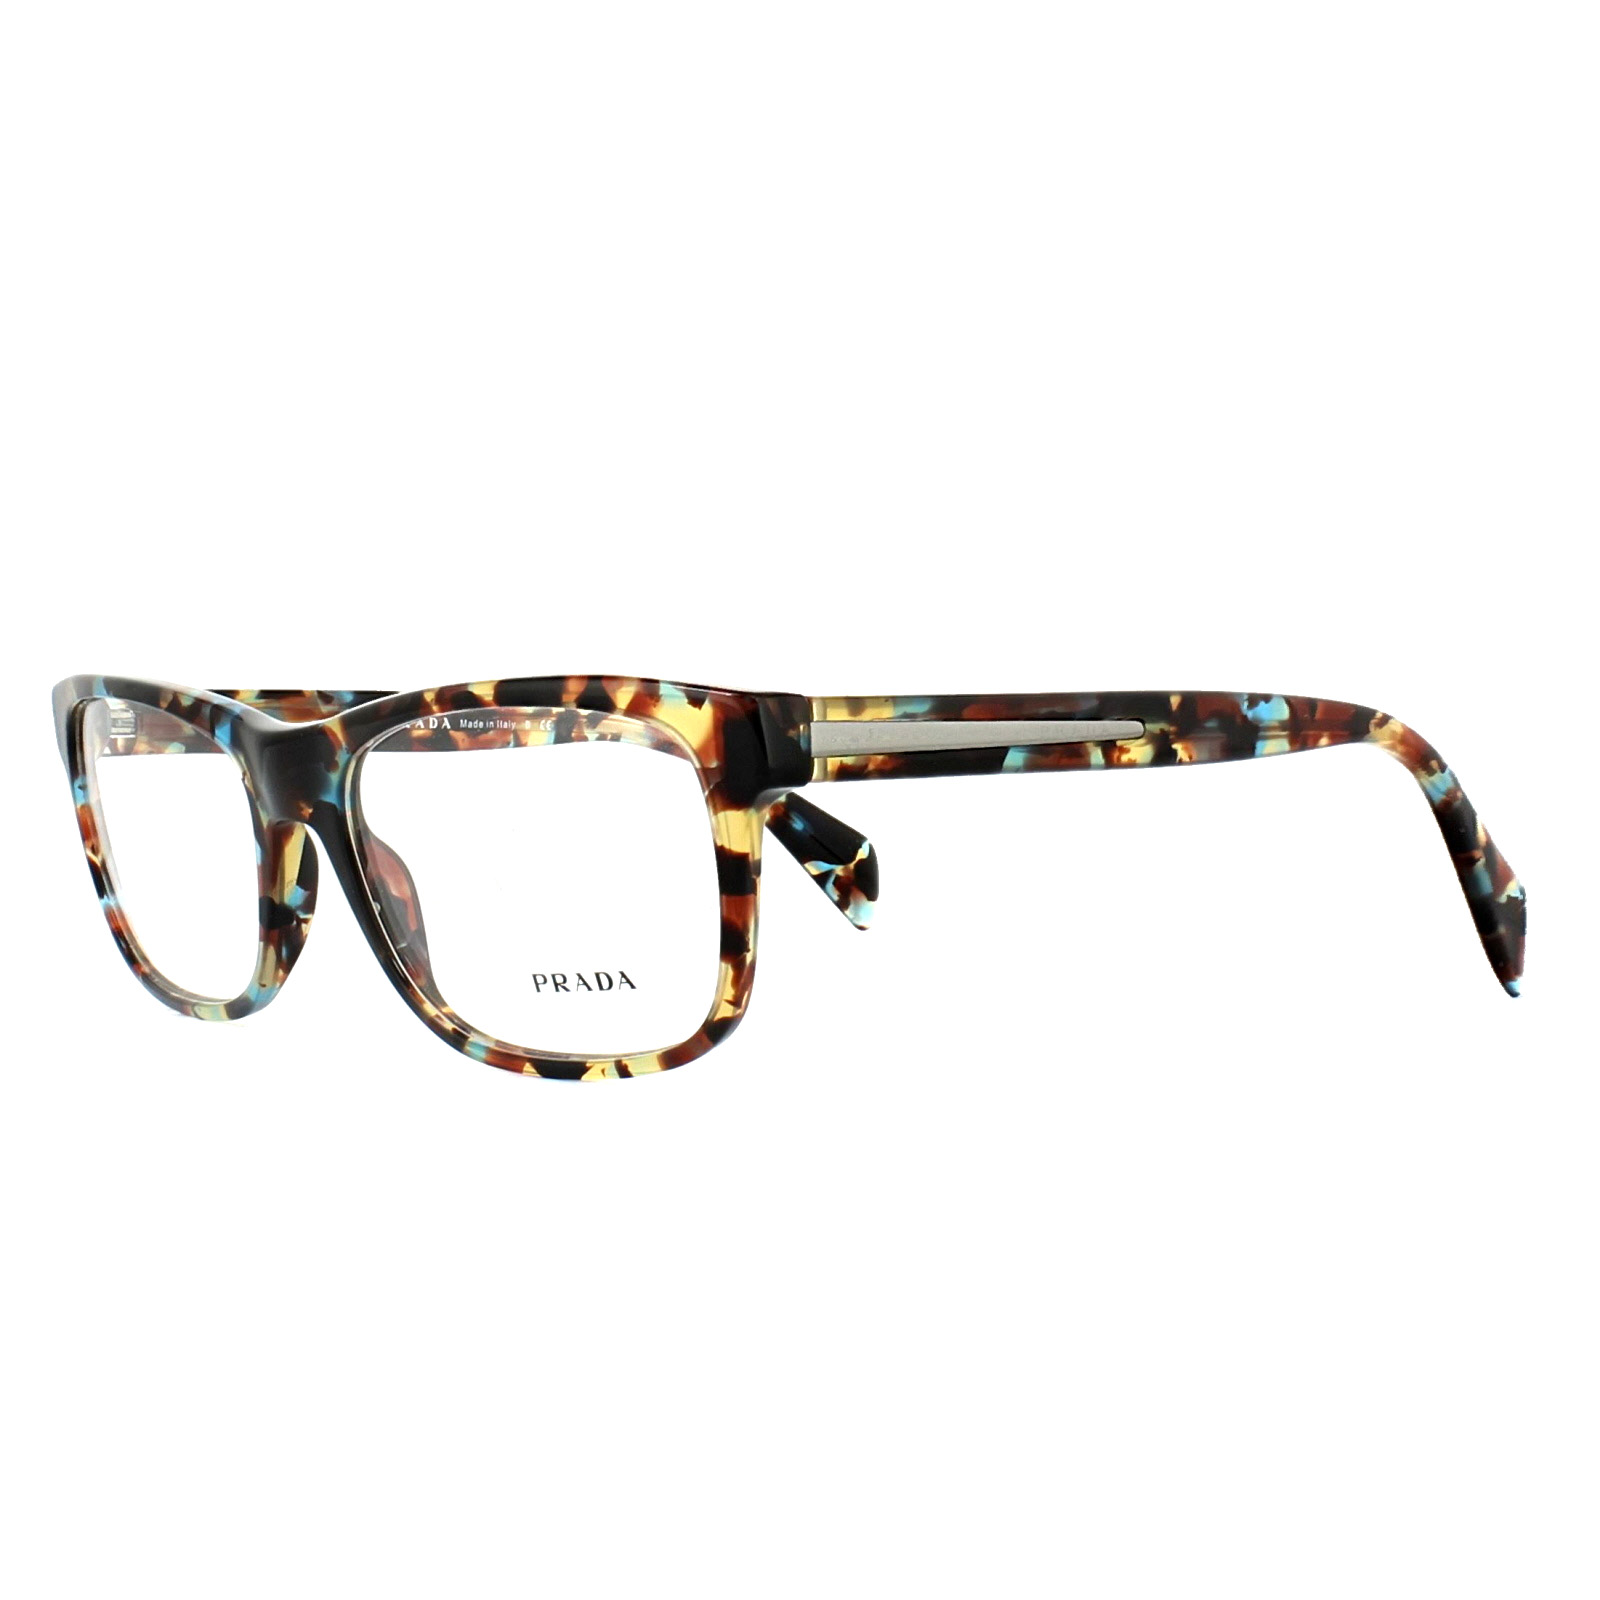 ca54f1765bc ... ebay sentinel prada glasses frames pr19pv nag1o1 spottted blue red  brown 55mm mens womens 8706e 2cc4a